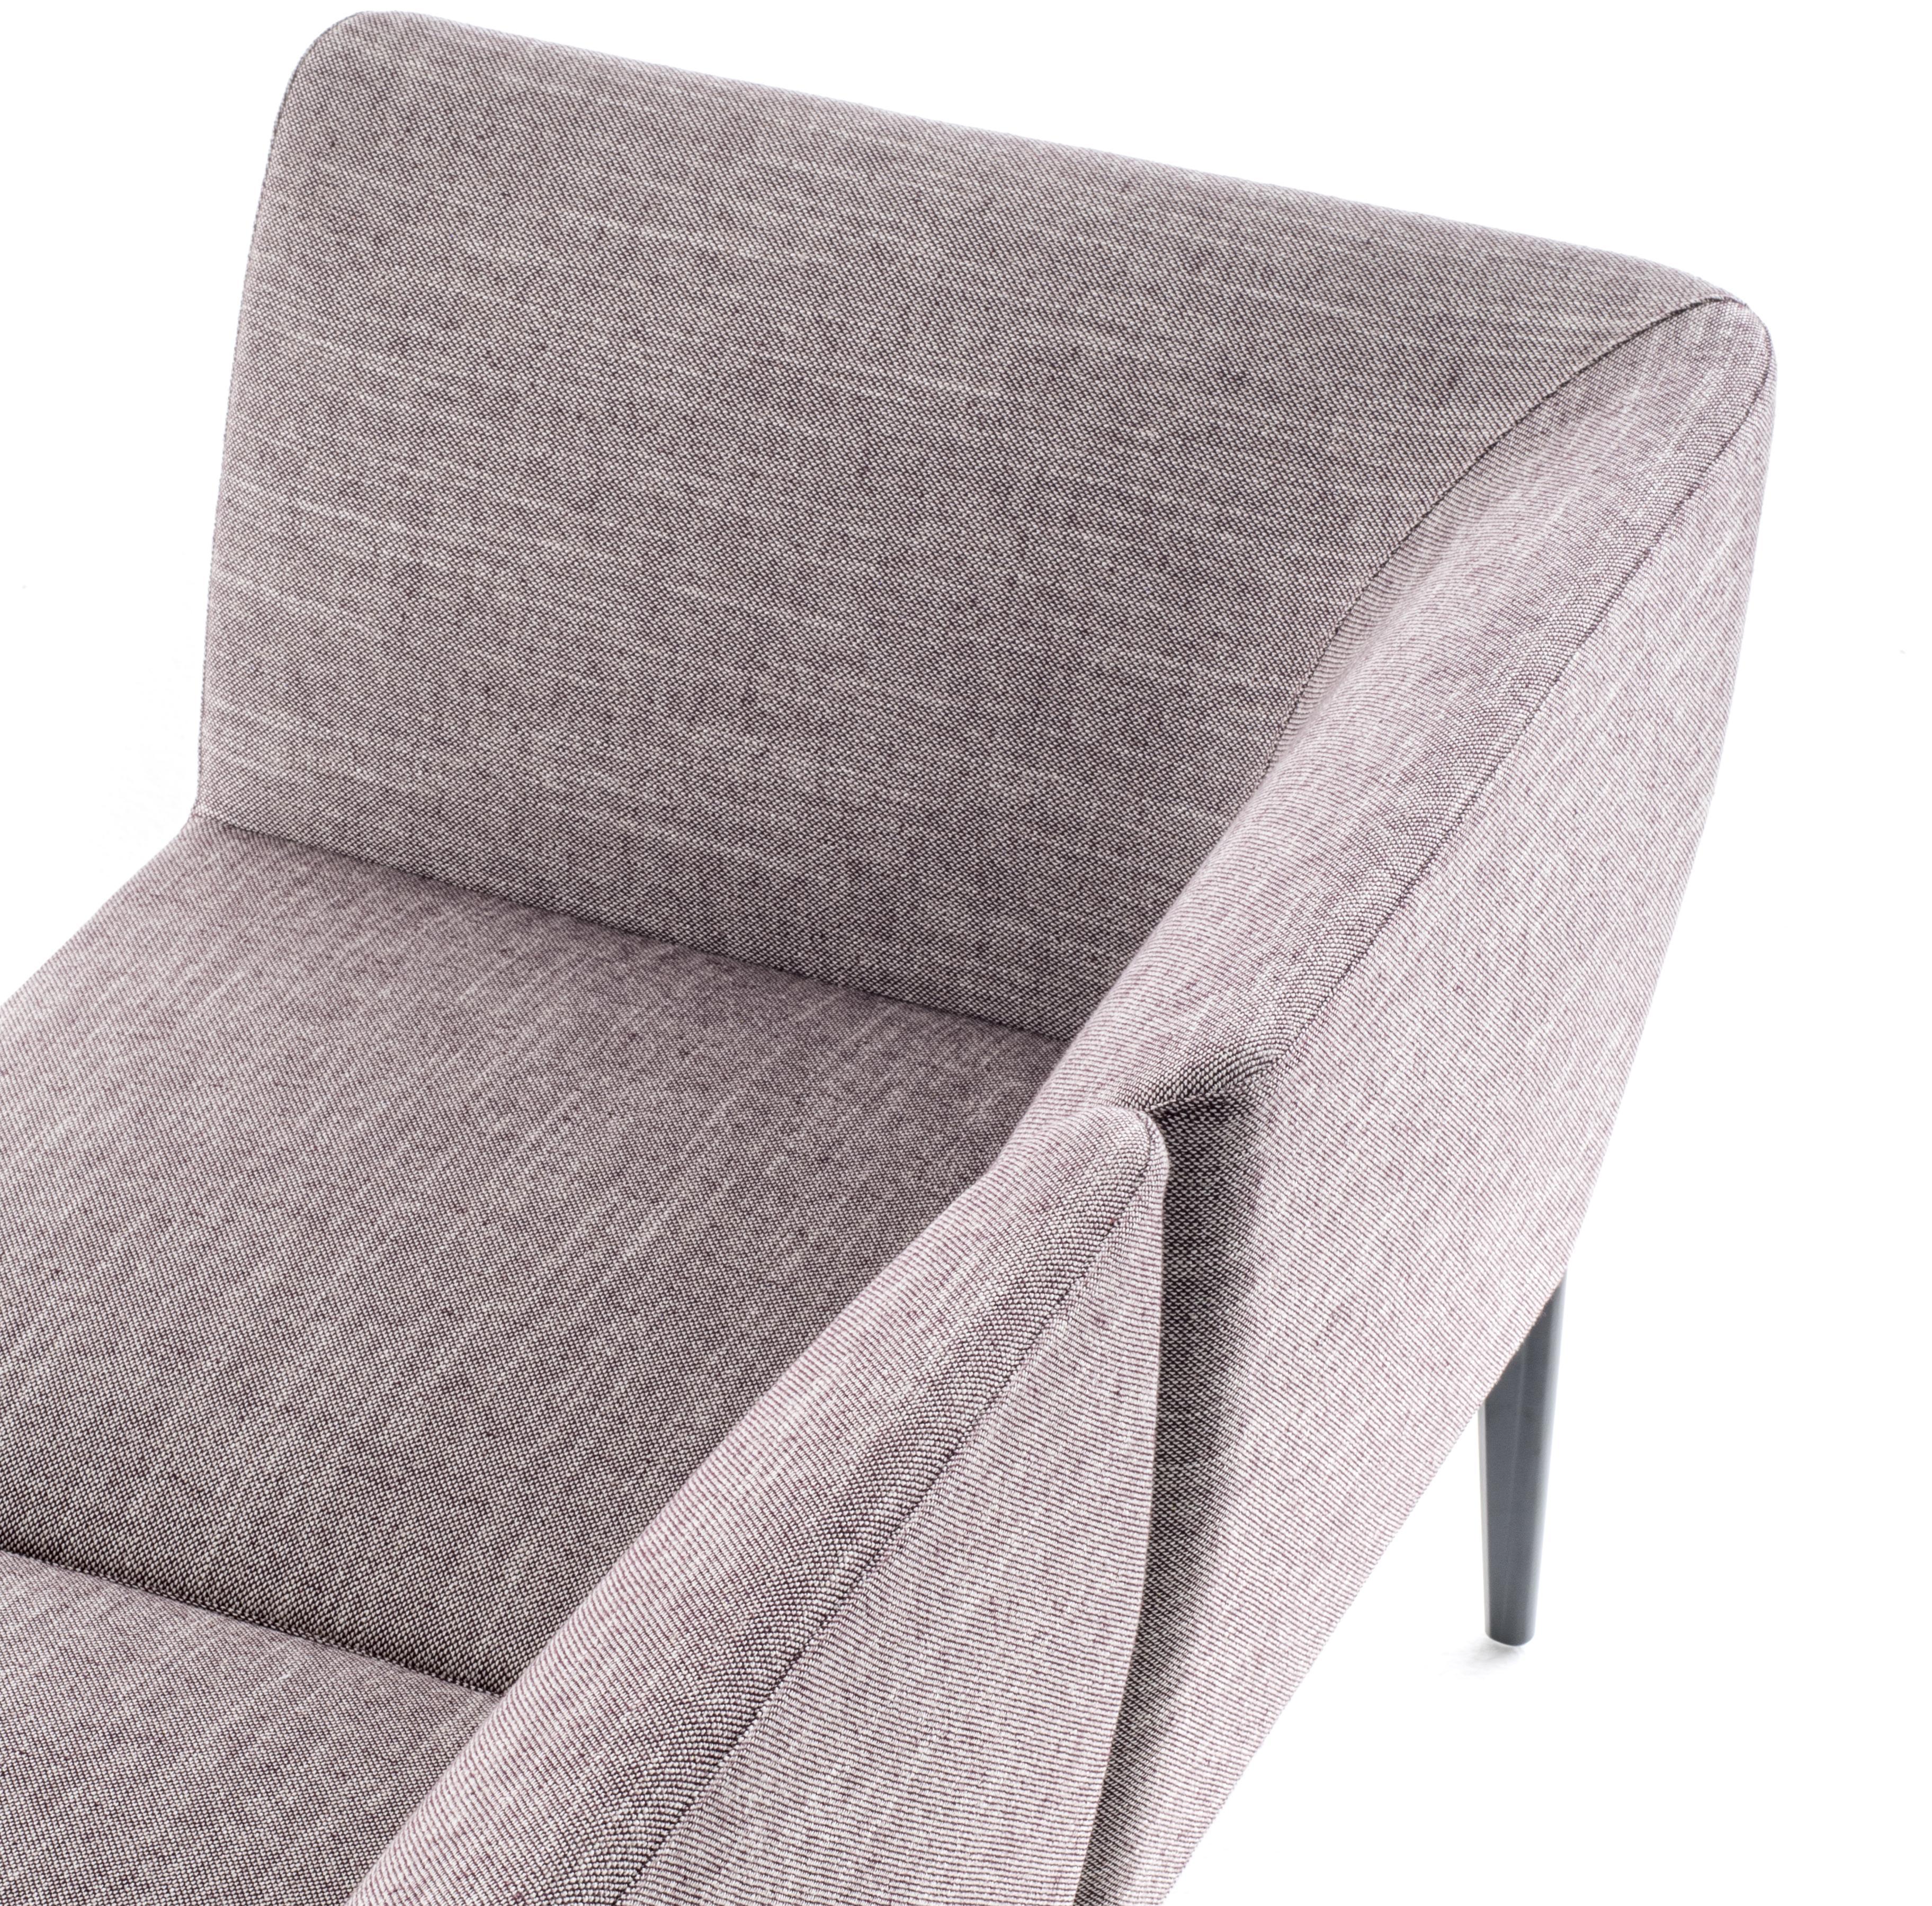 Designerska sofa tapicerowana SOCIAL plus Pedrali